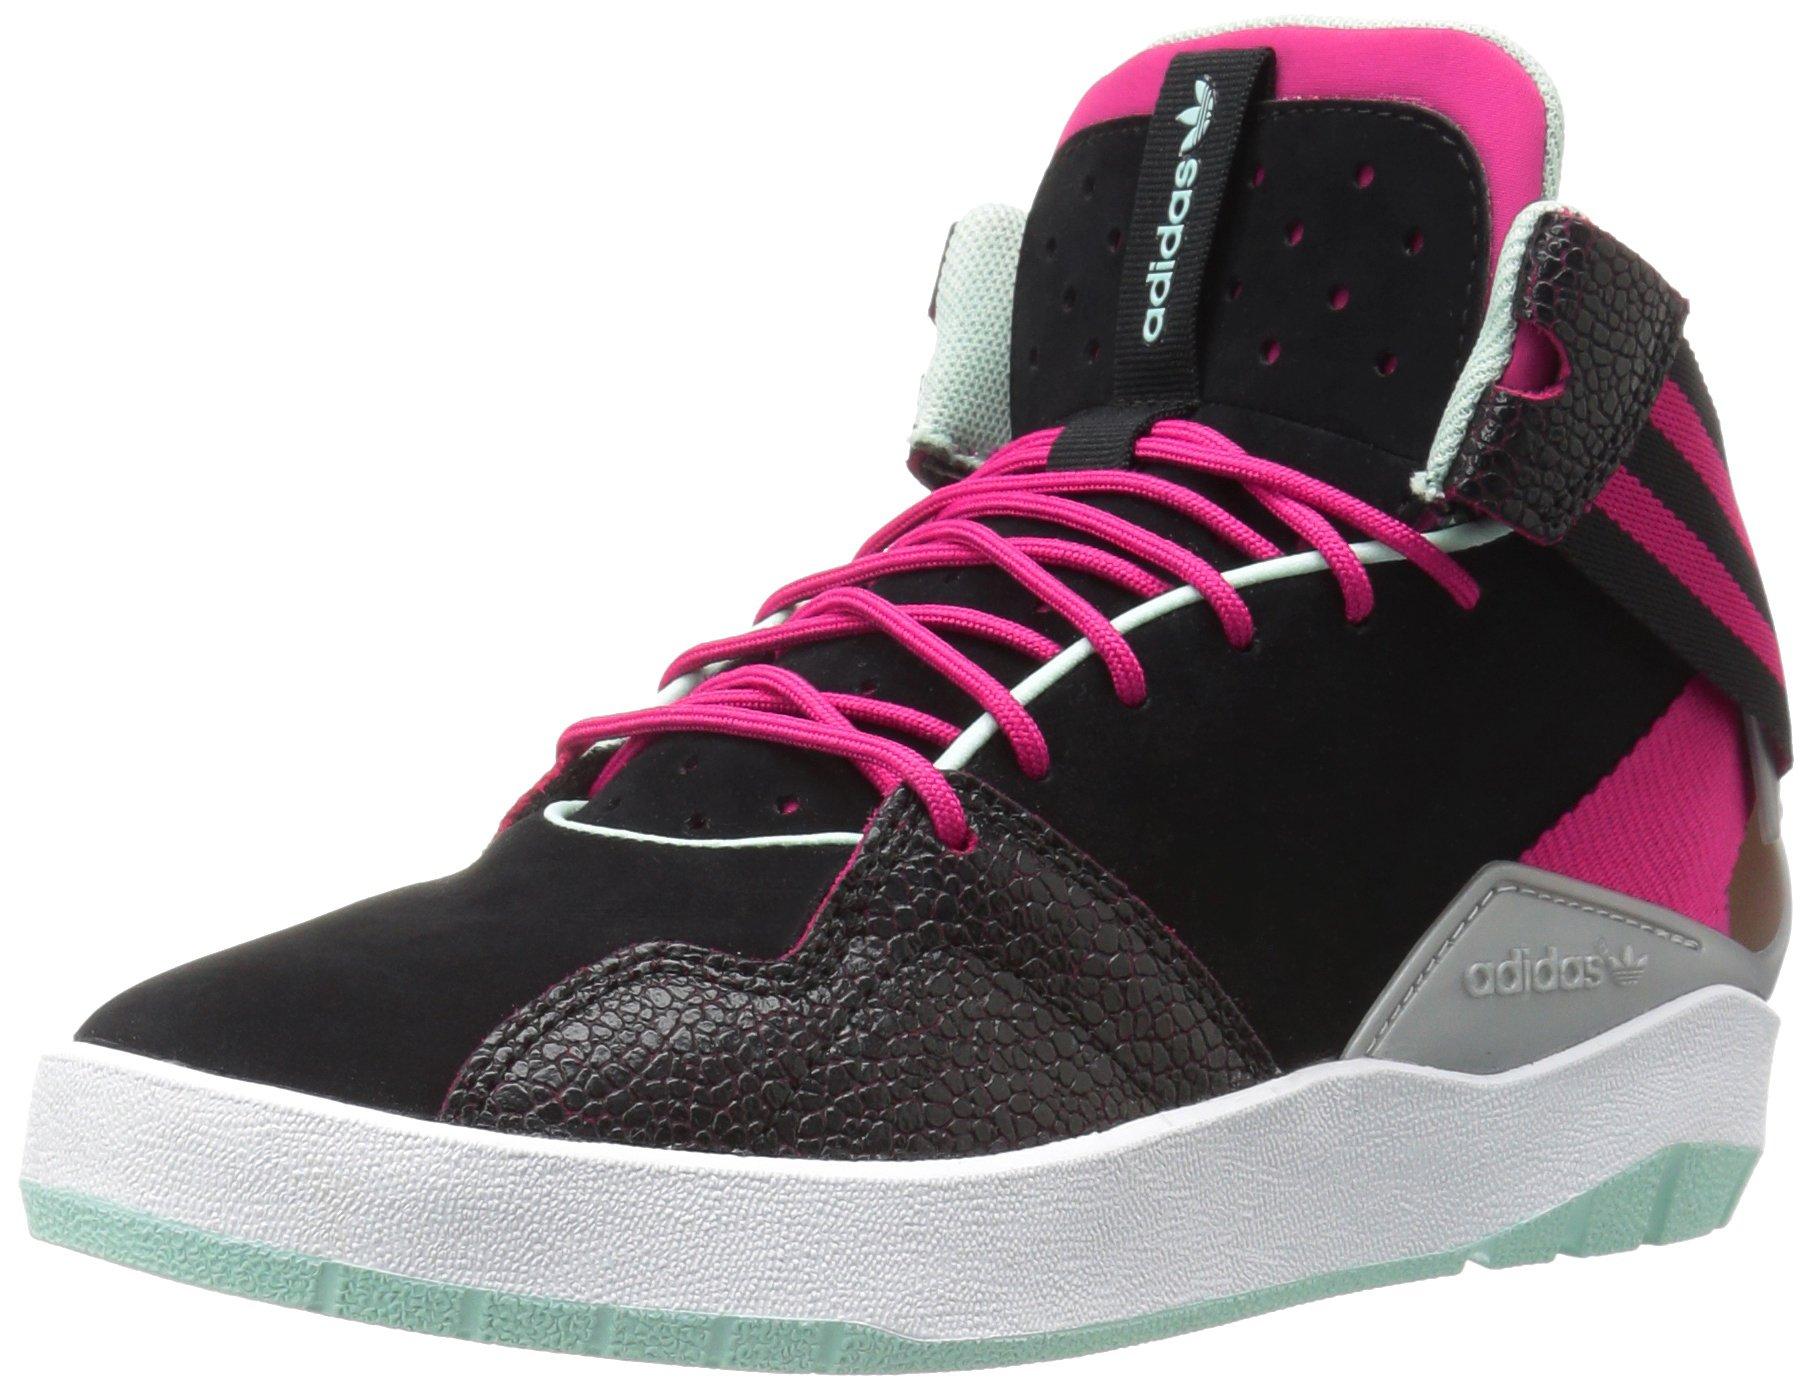 online store c2aaf cc181 Galleon - Adidas Originals Girls Crestwood Mid J Skate Shoe, BlackPink  Buzz Ice Green Fabric, 4.5 M US Big Kid